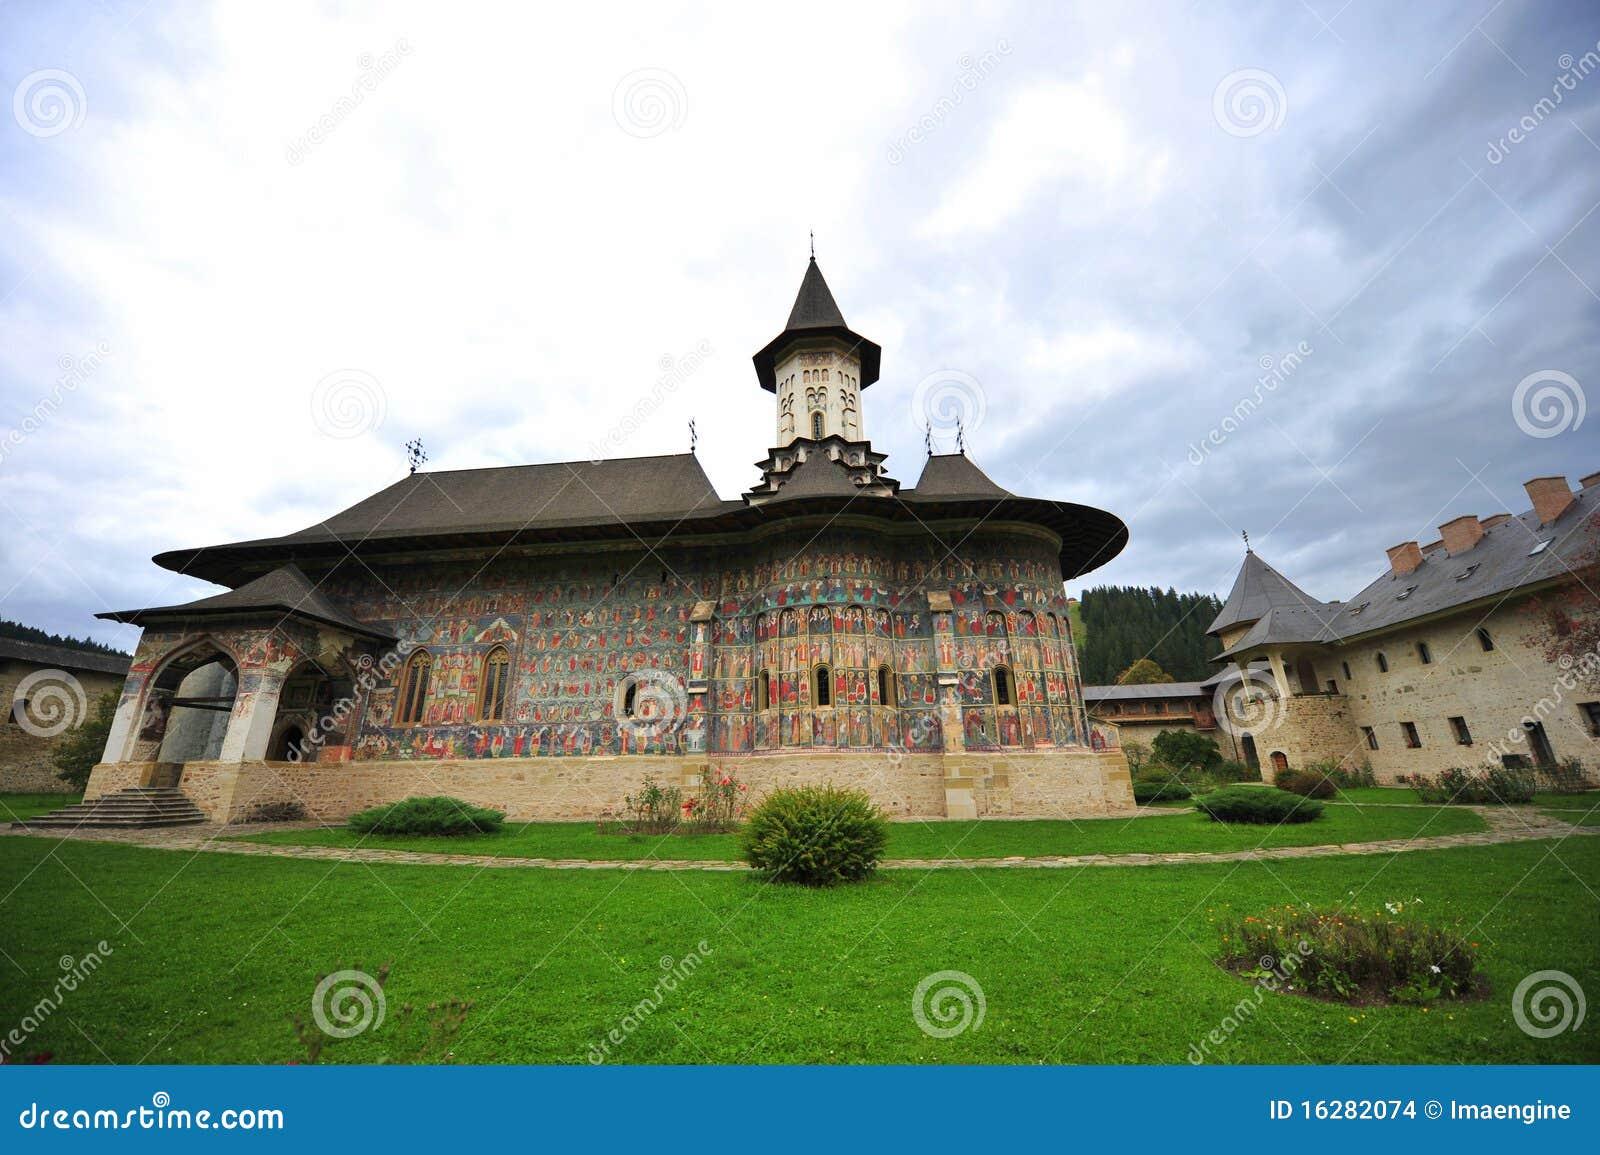 Héritage de l UNESCO - monastères de la Moldavie : Sucevita